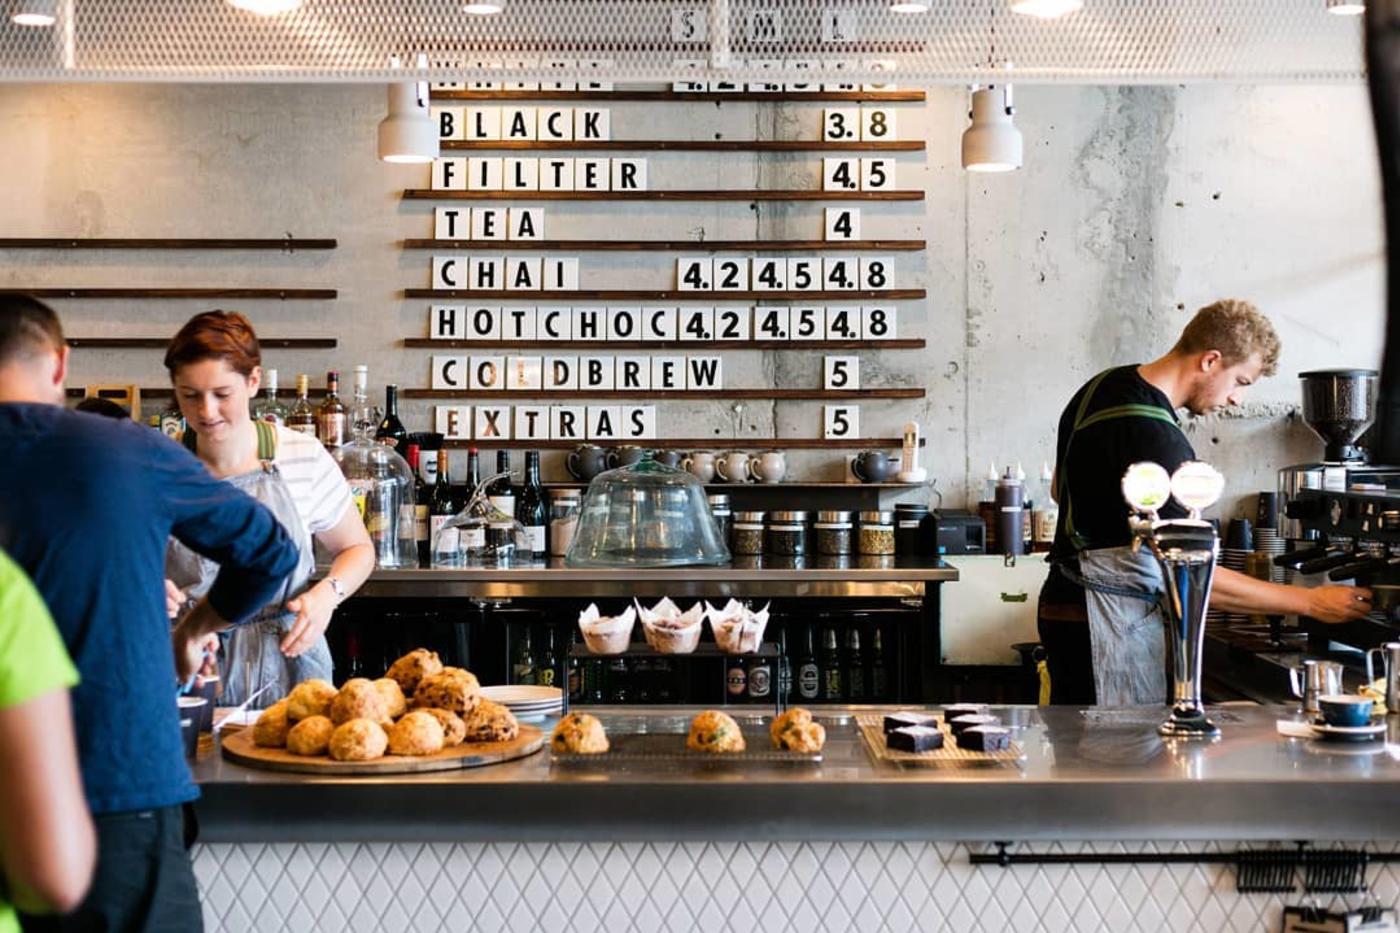 Franks Eatery Cafe